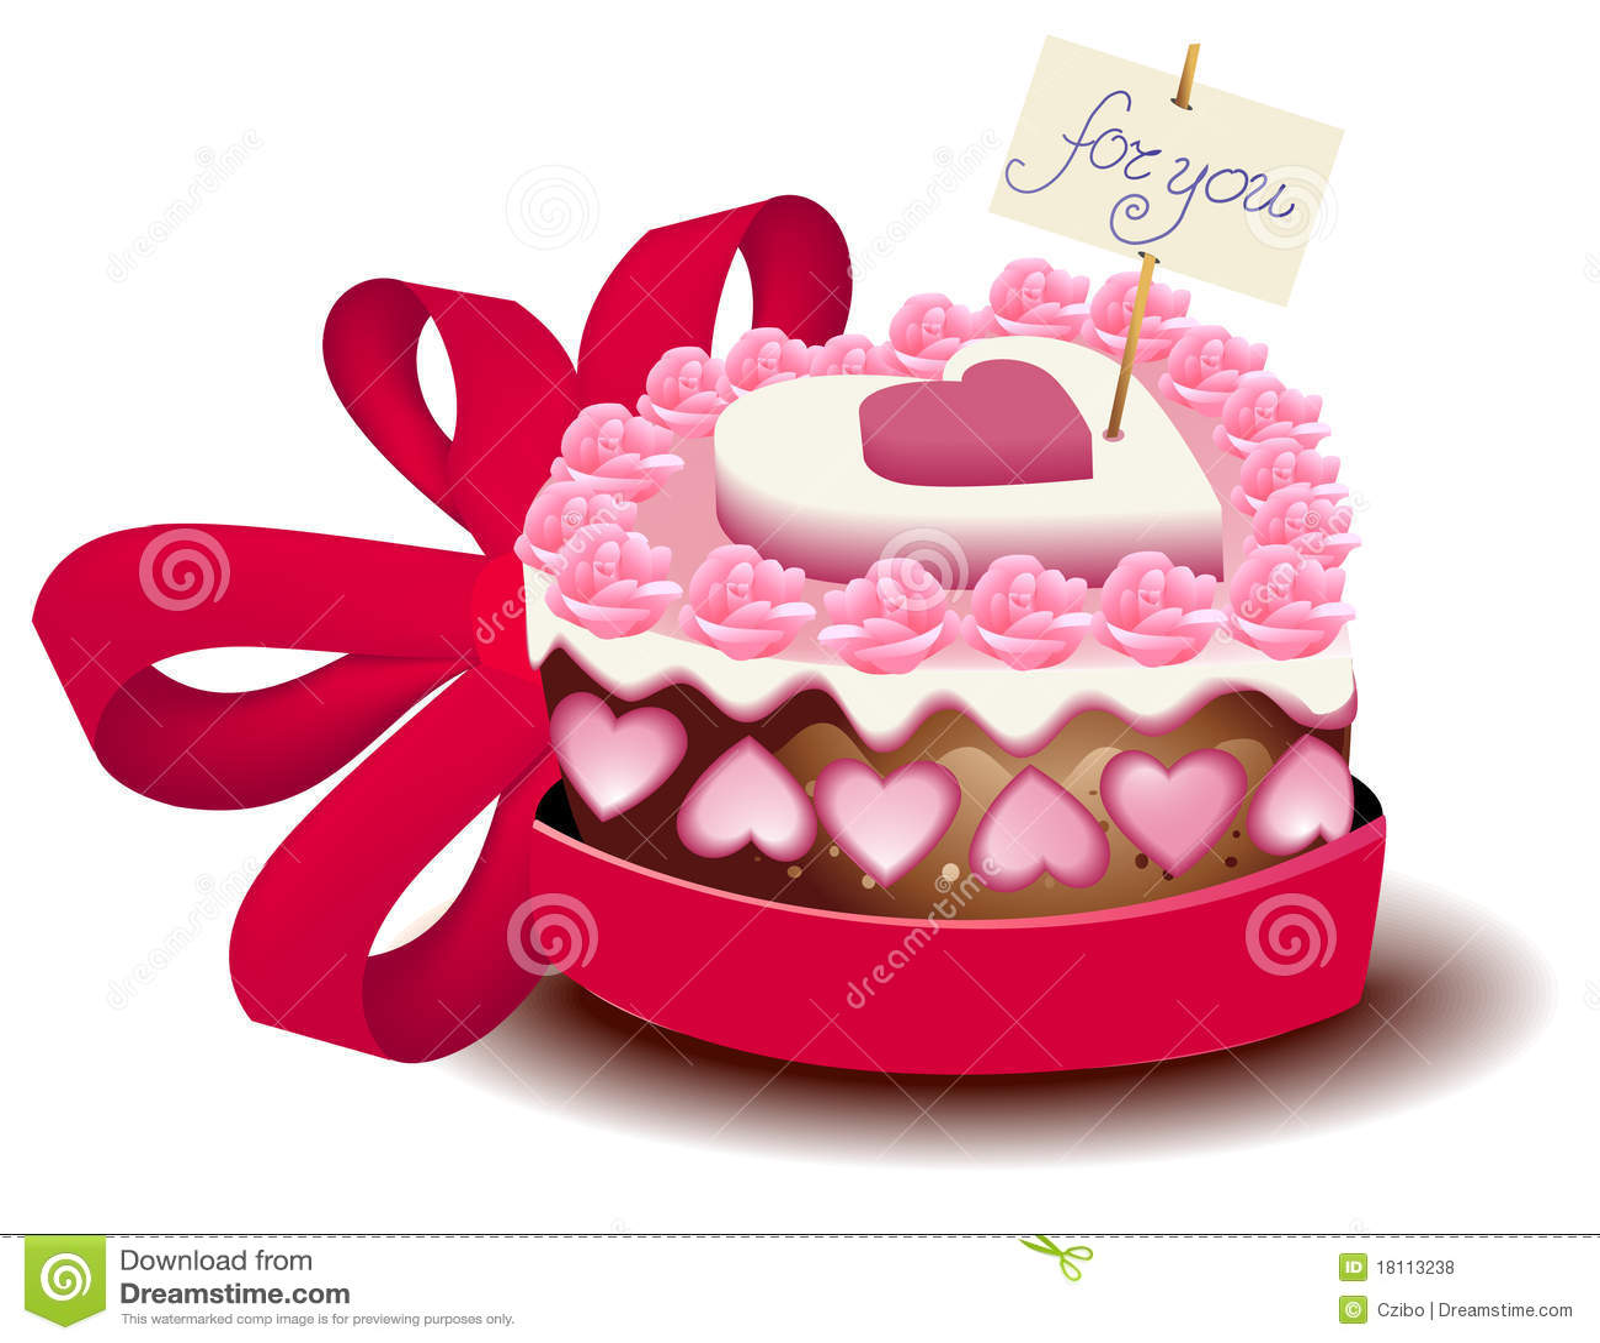 Valentine s cake stock vector. Image of cake, light ...